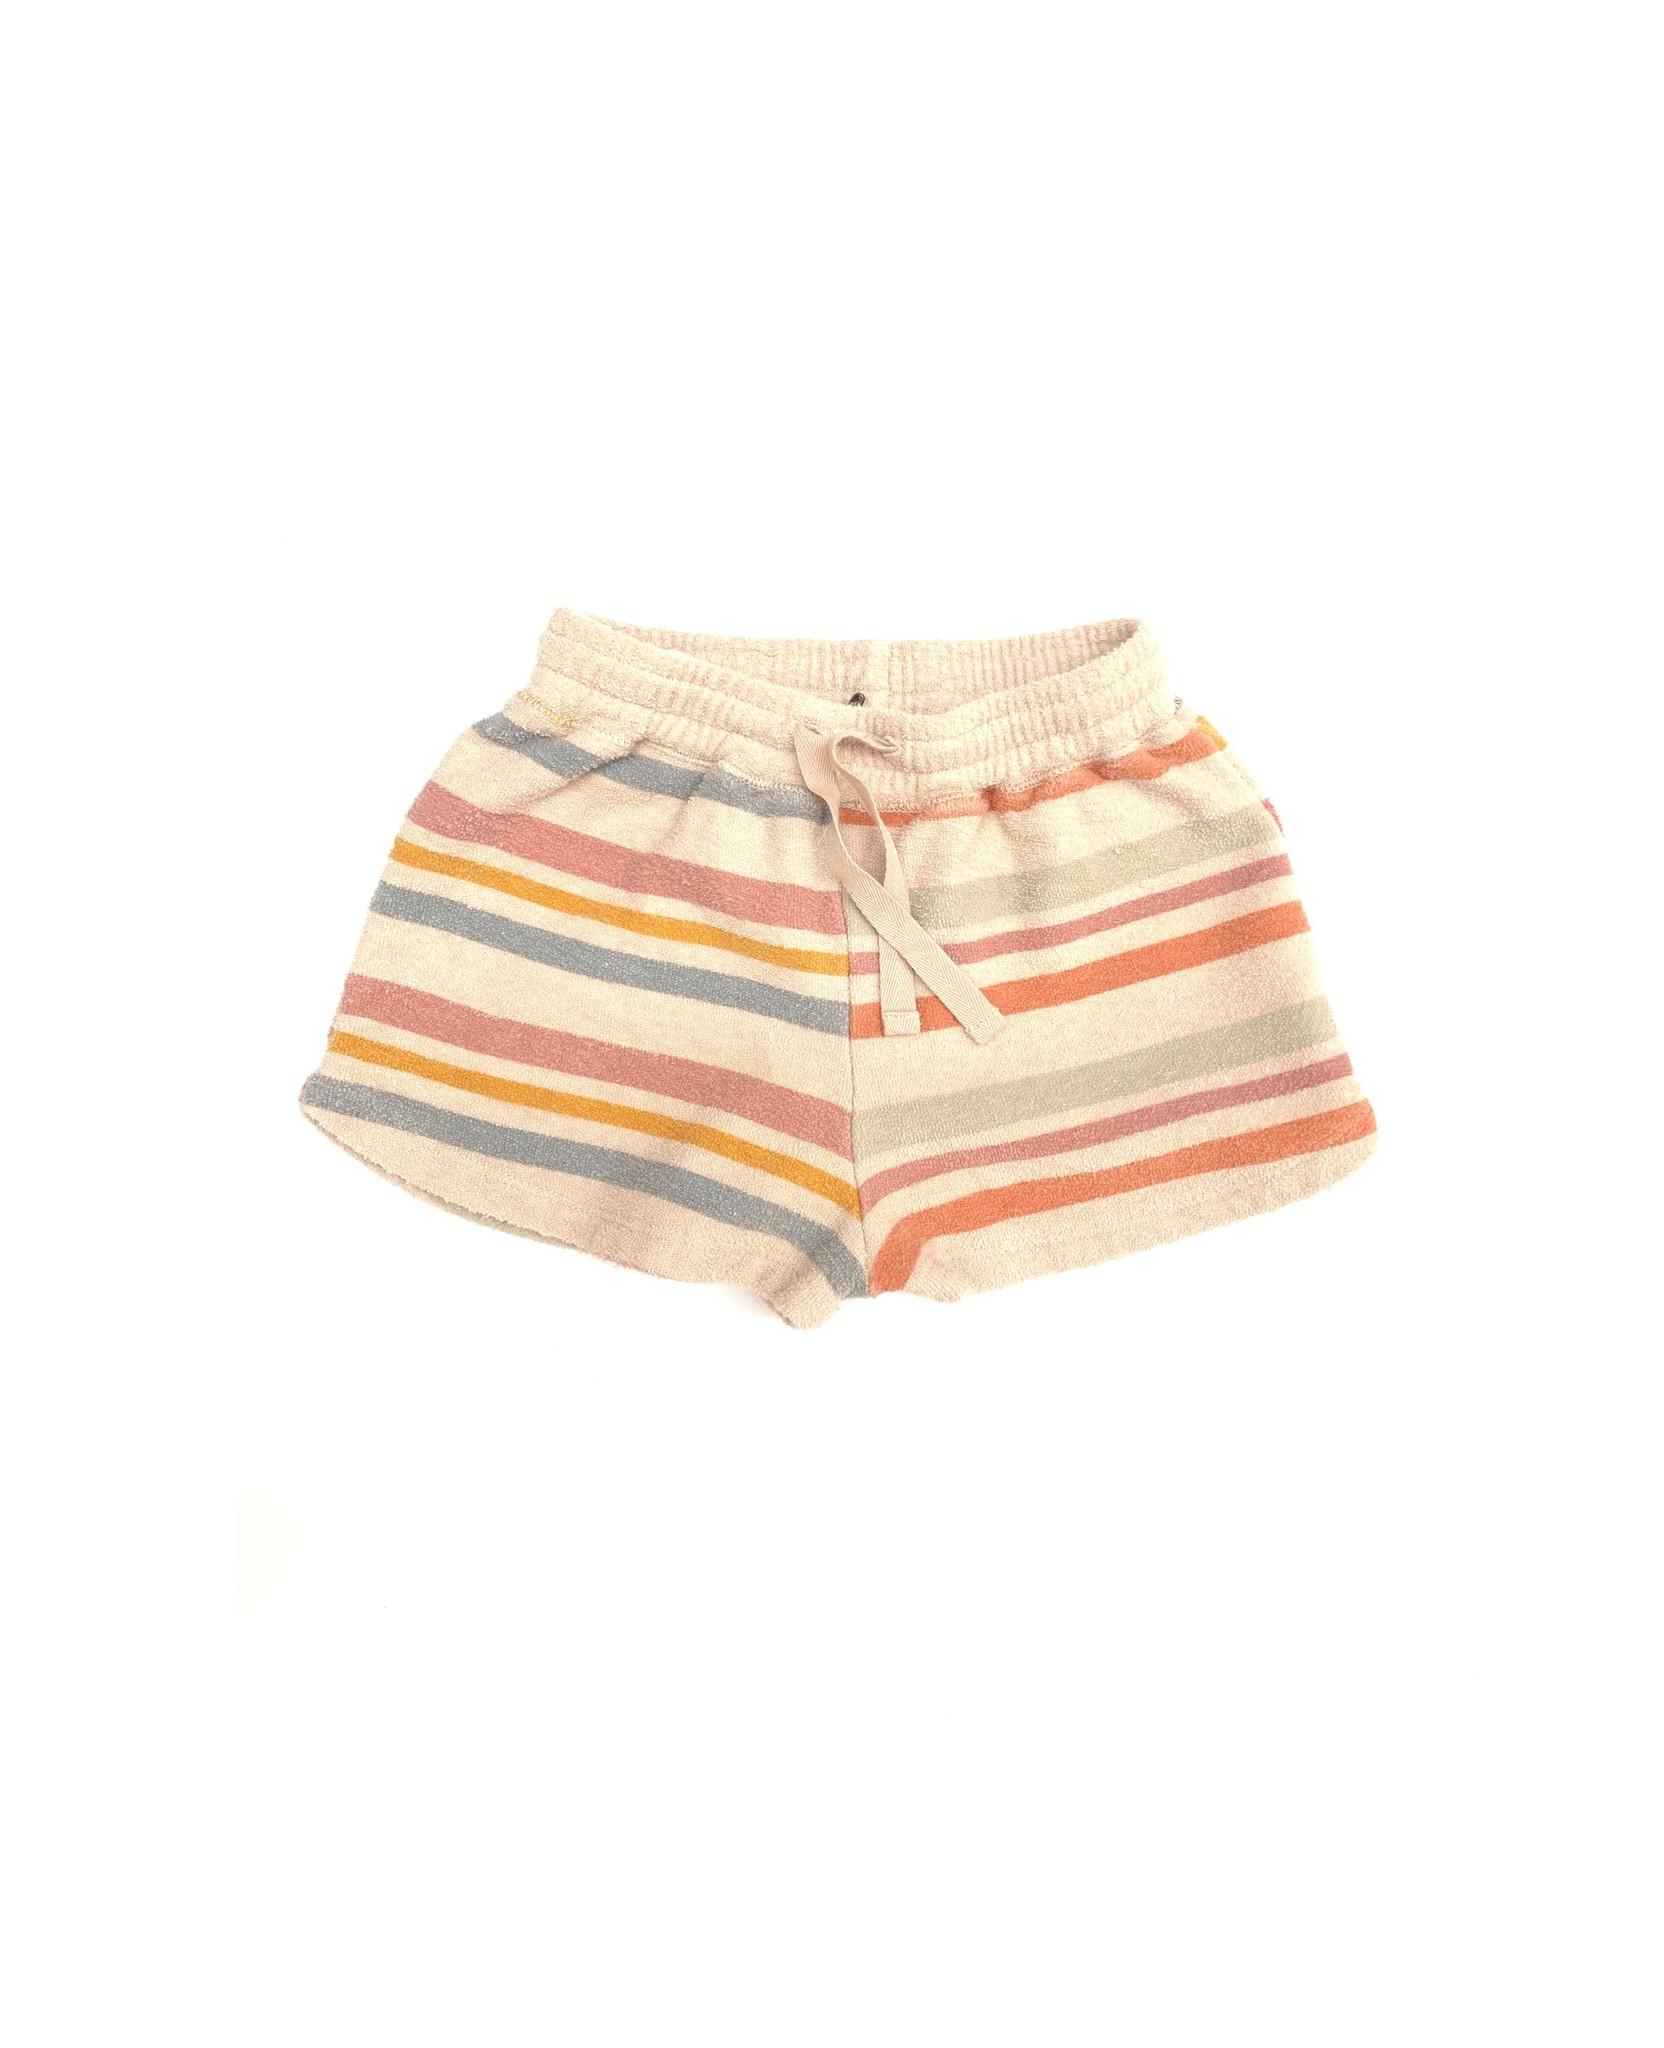 Terry shorts - Stripe-1